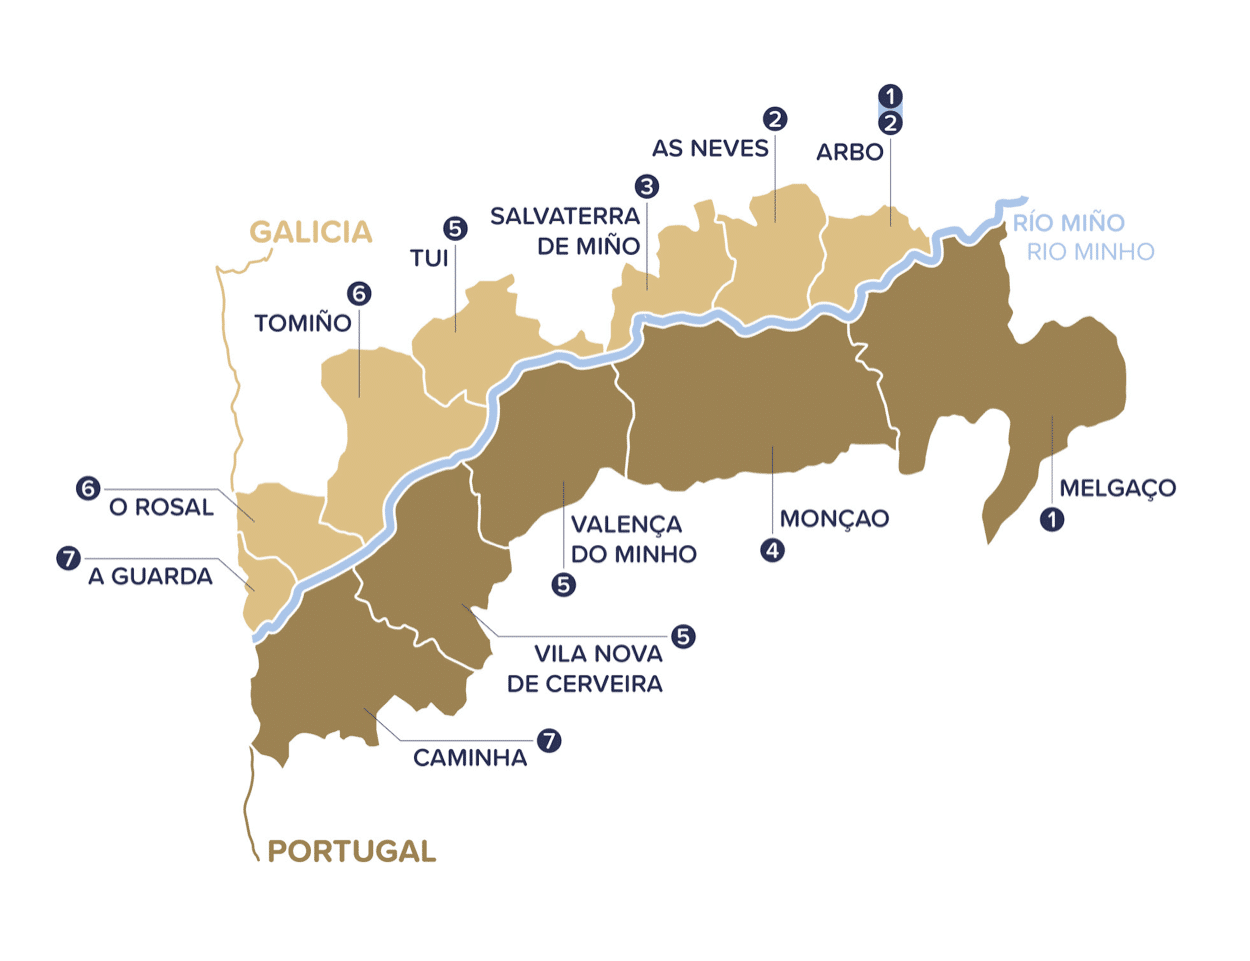 mapa concellos rio minho